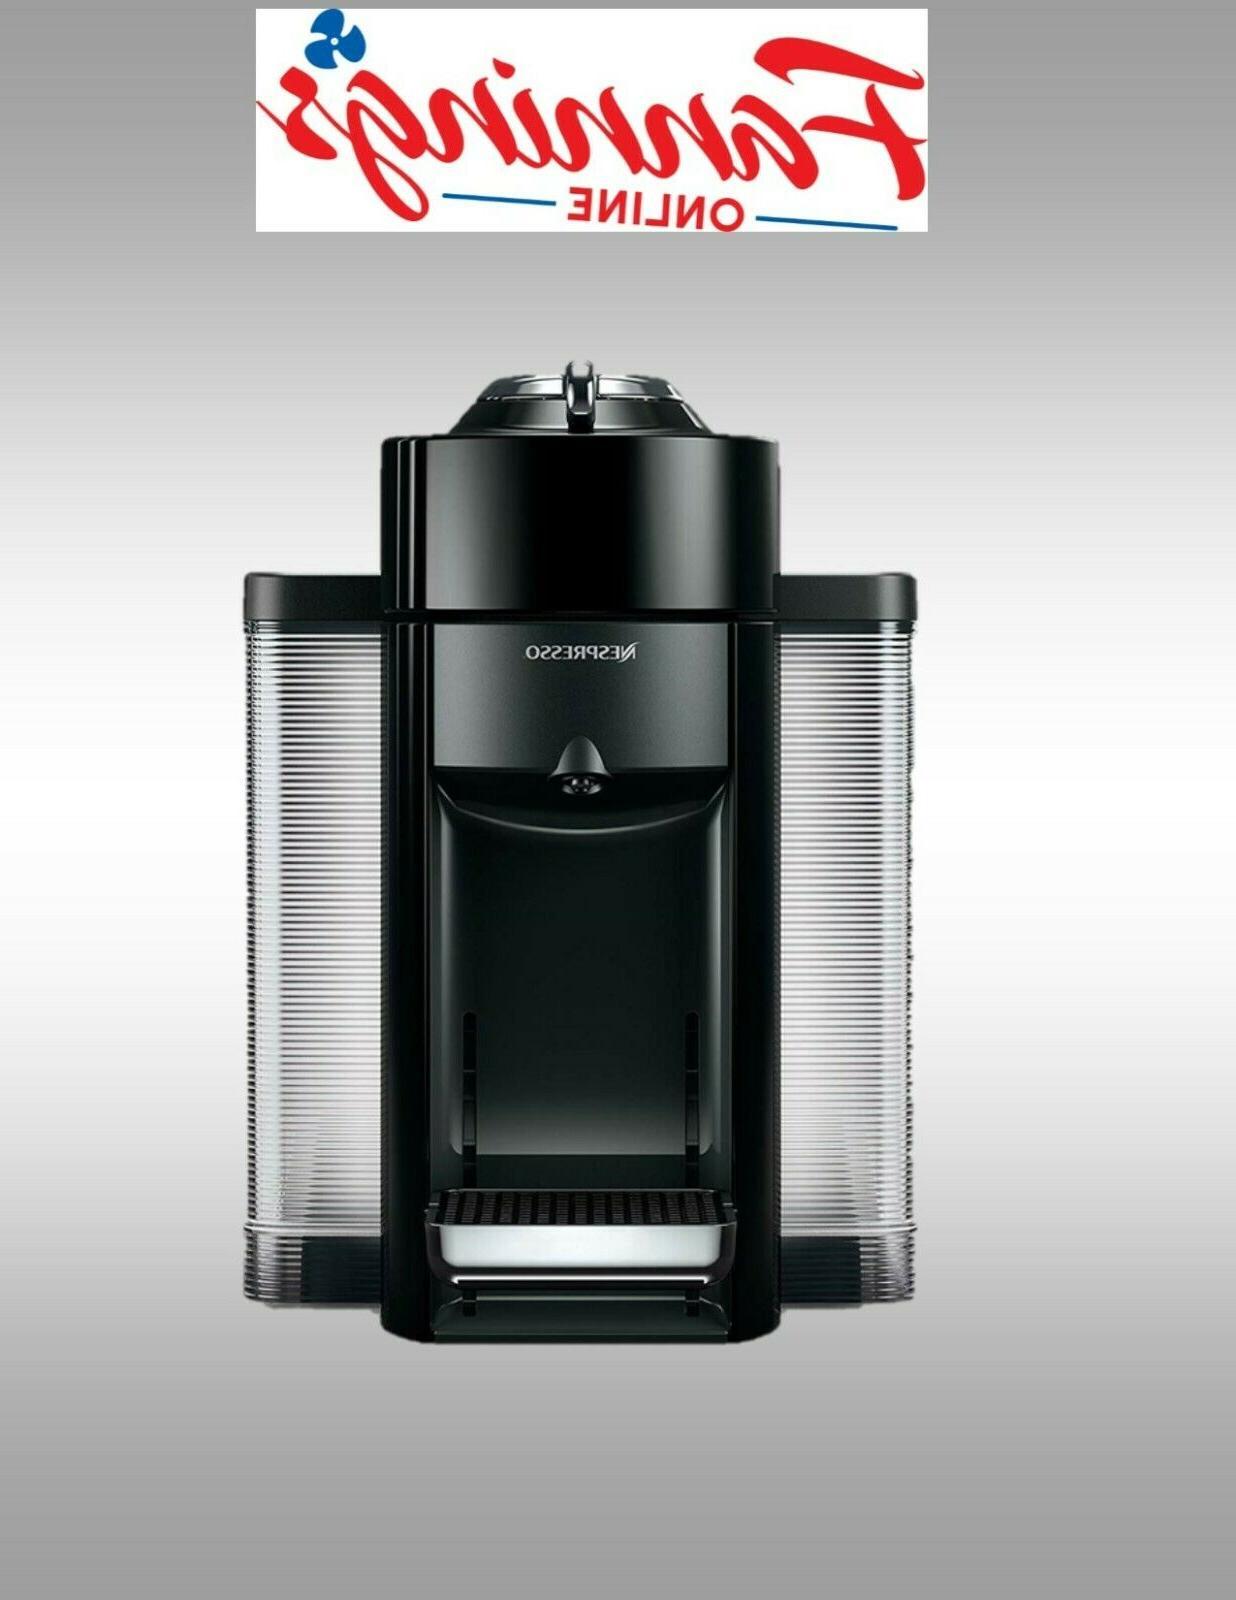 nespresso env135b coffee and espresso machine by